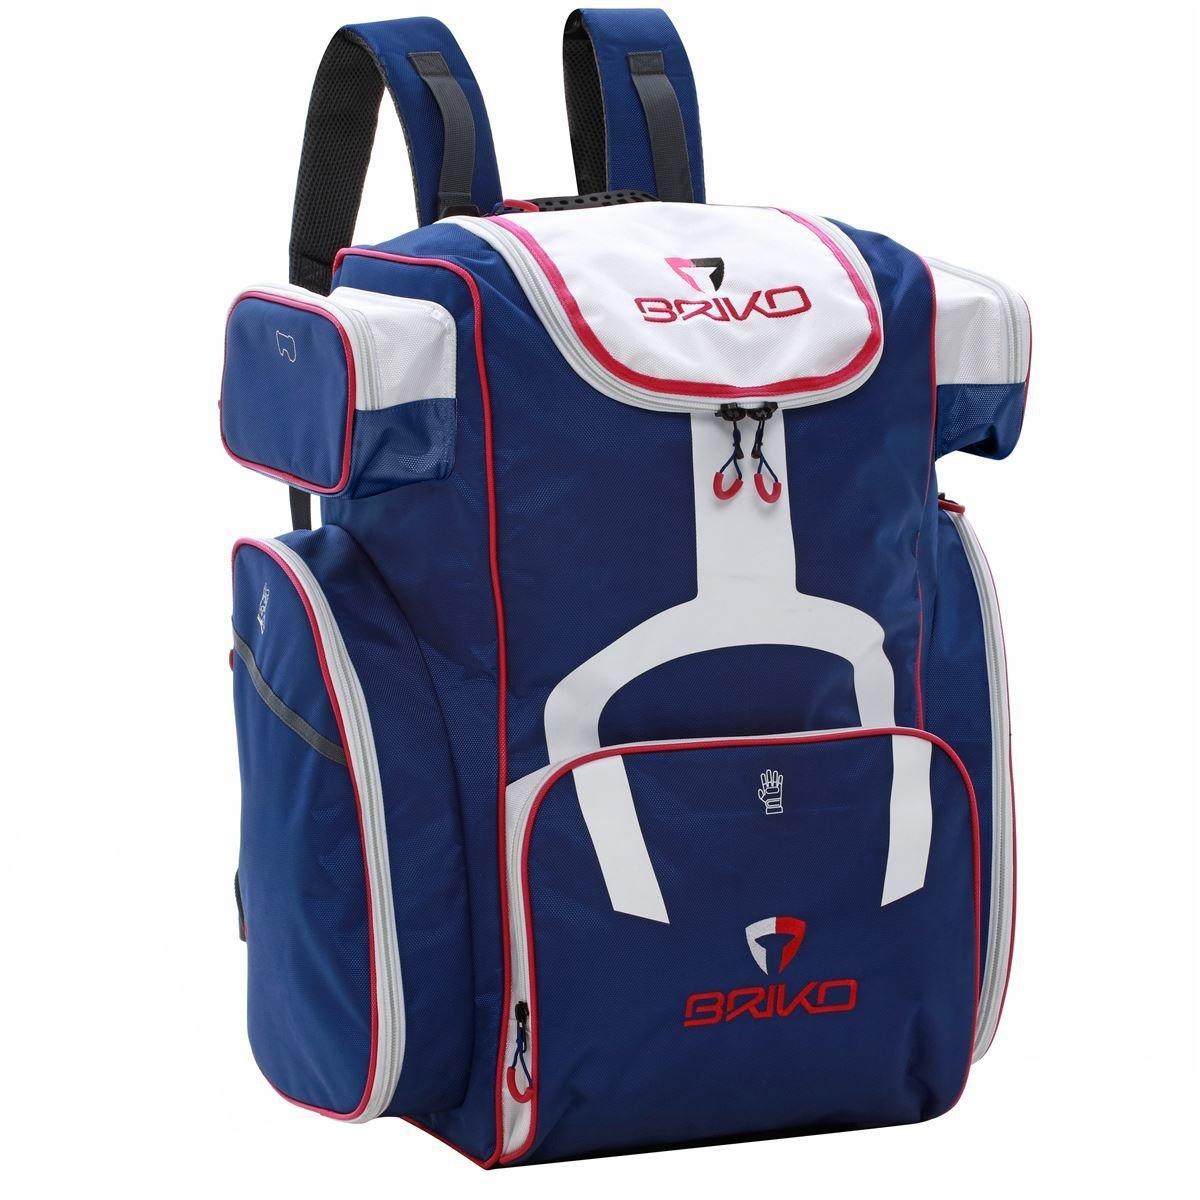 Briko Race Bag Blue Pink